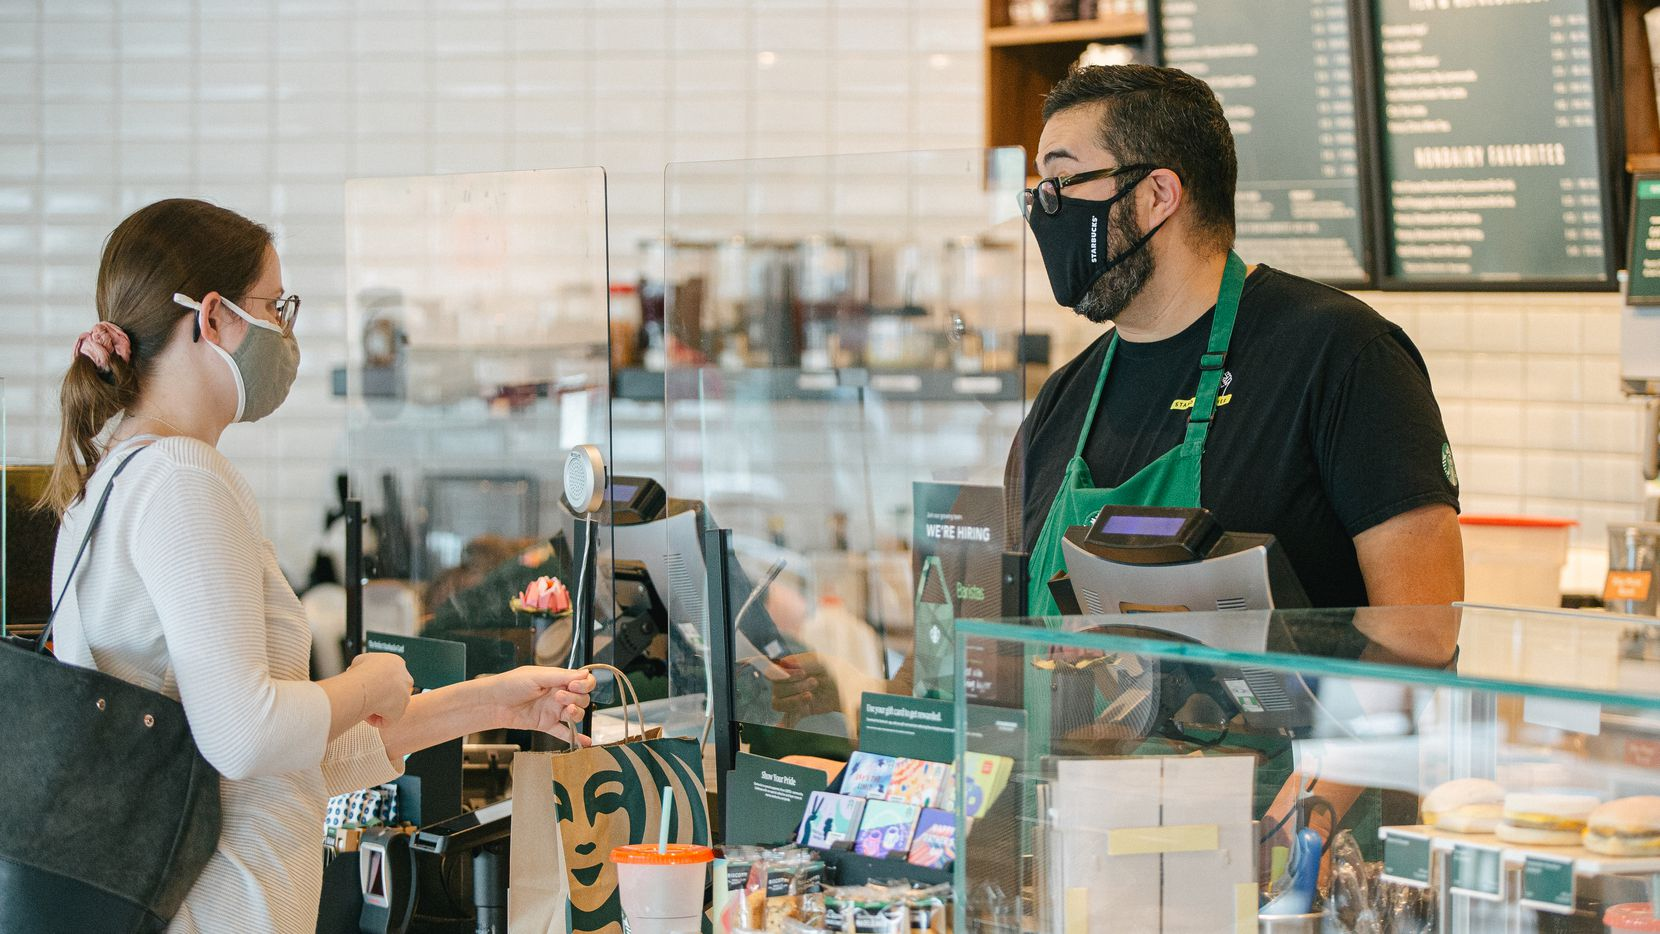 Frank Martinez at the Starbucks where he works.